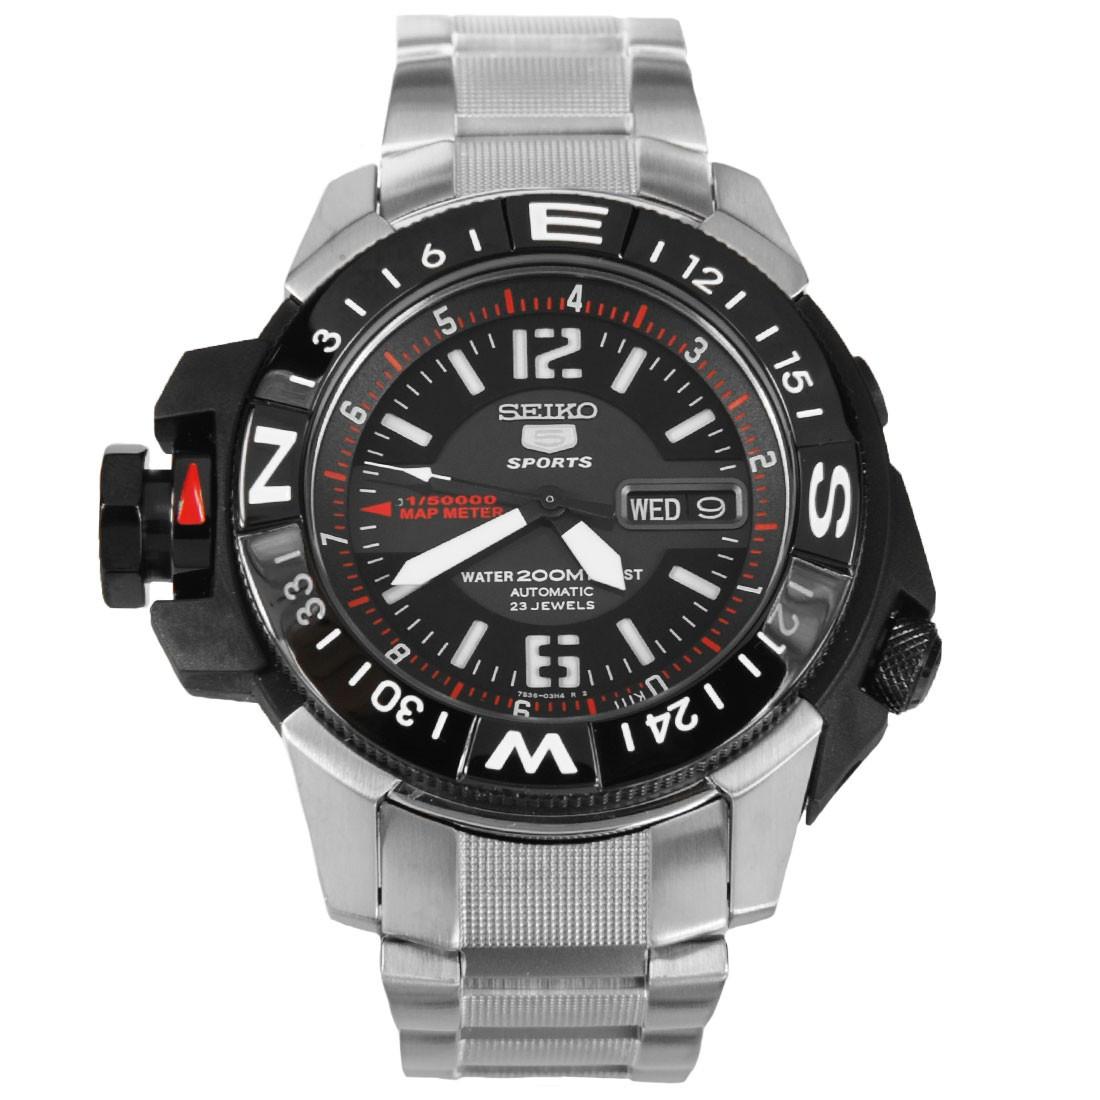 Часы Seiko 5 Sports SKZ229K1 Automatic Map Meter